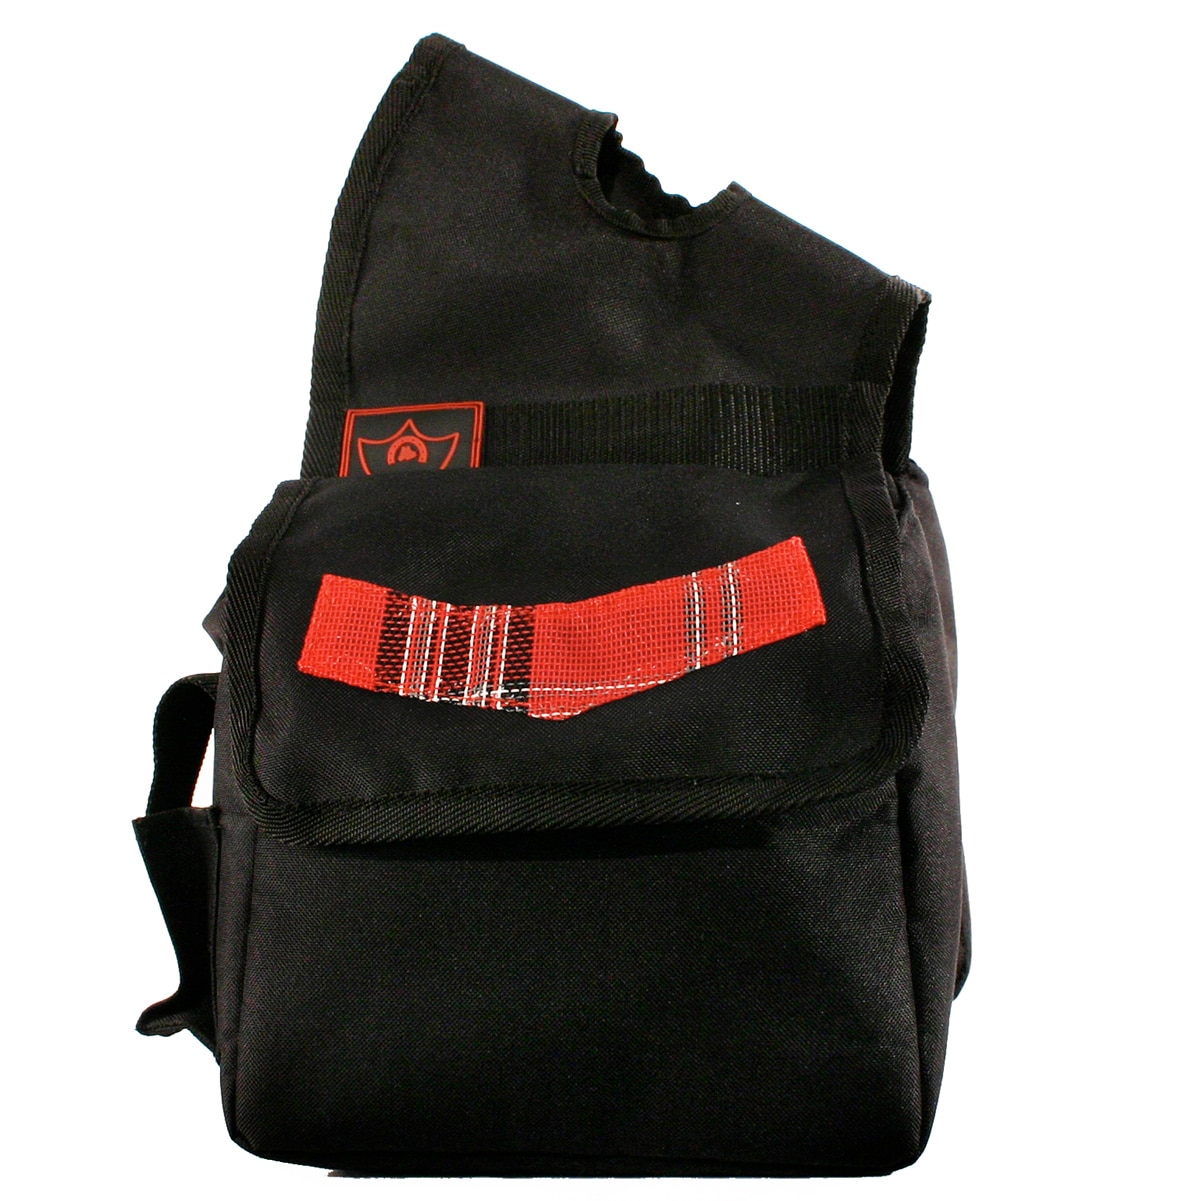 Kensington All Around Insulated Horn Bag